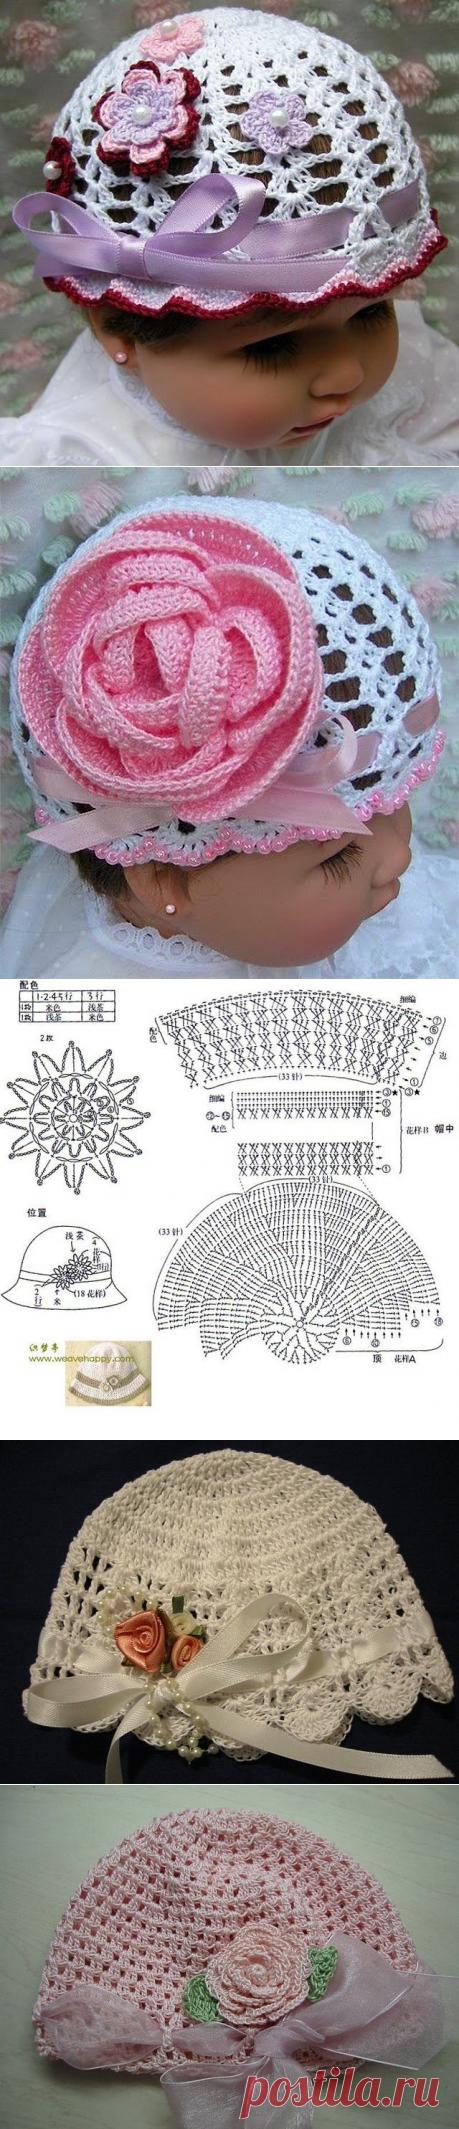 Идеи и схемы шляпок и панамок